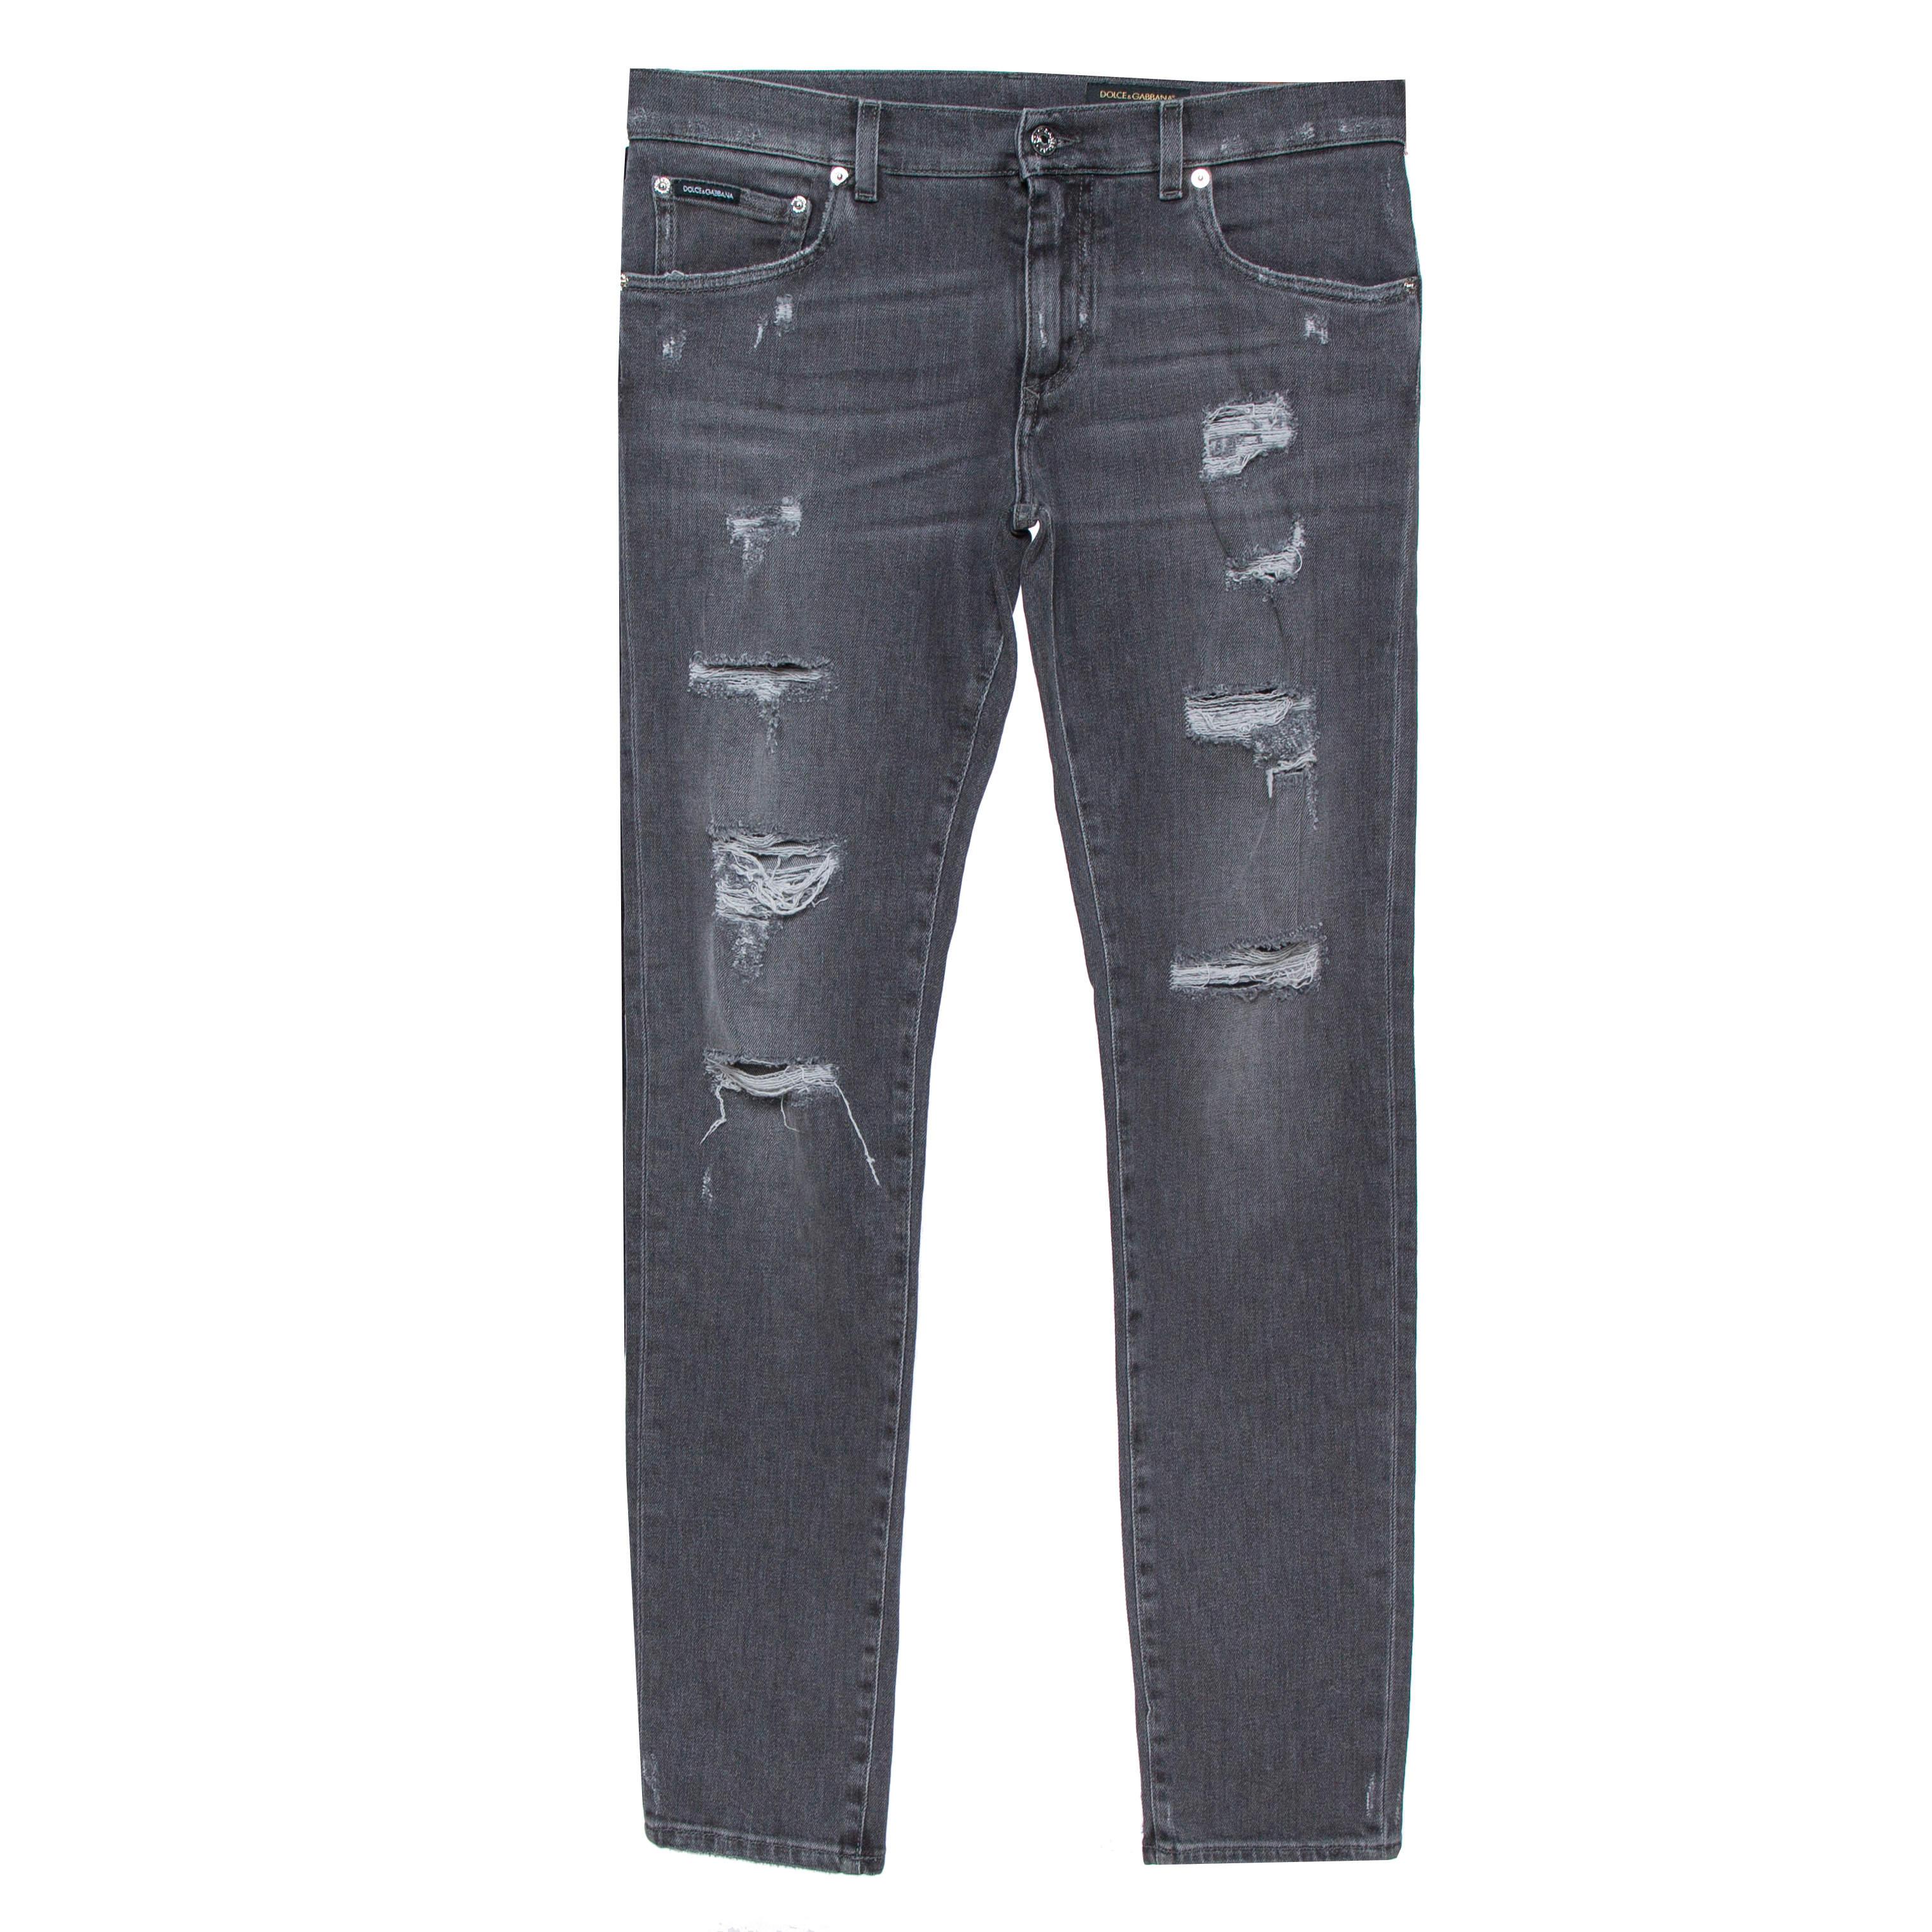 Dolce & Gabbana Grey Distressed Denim Skinny Jeans M